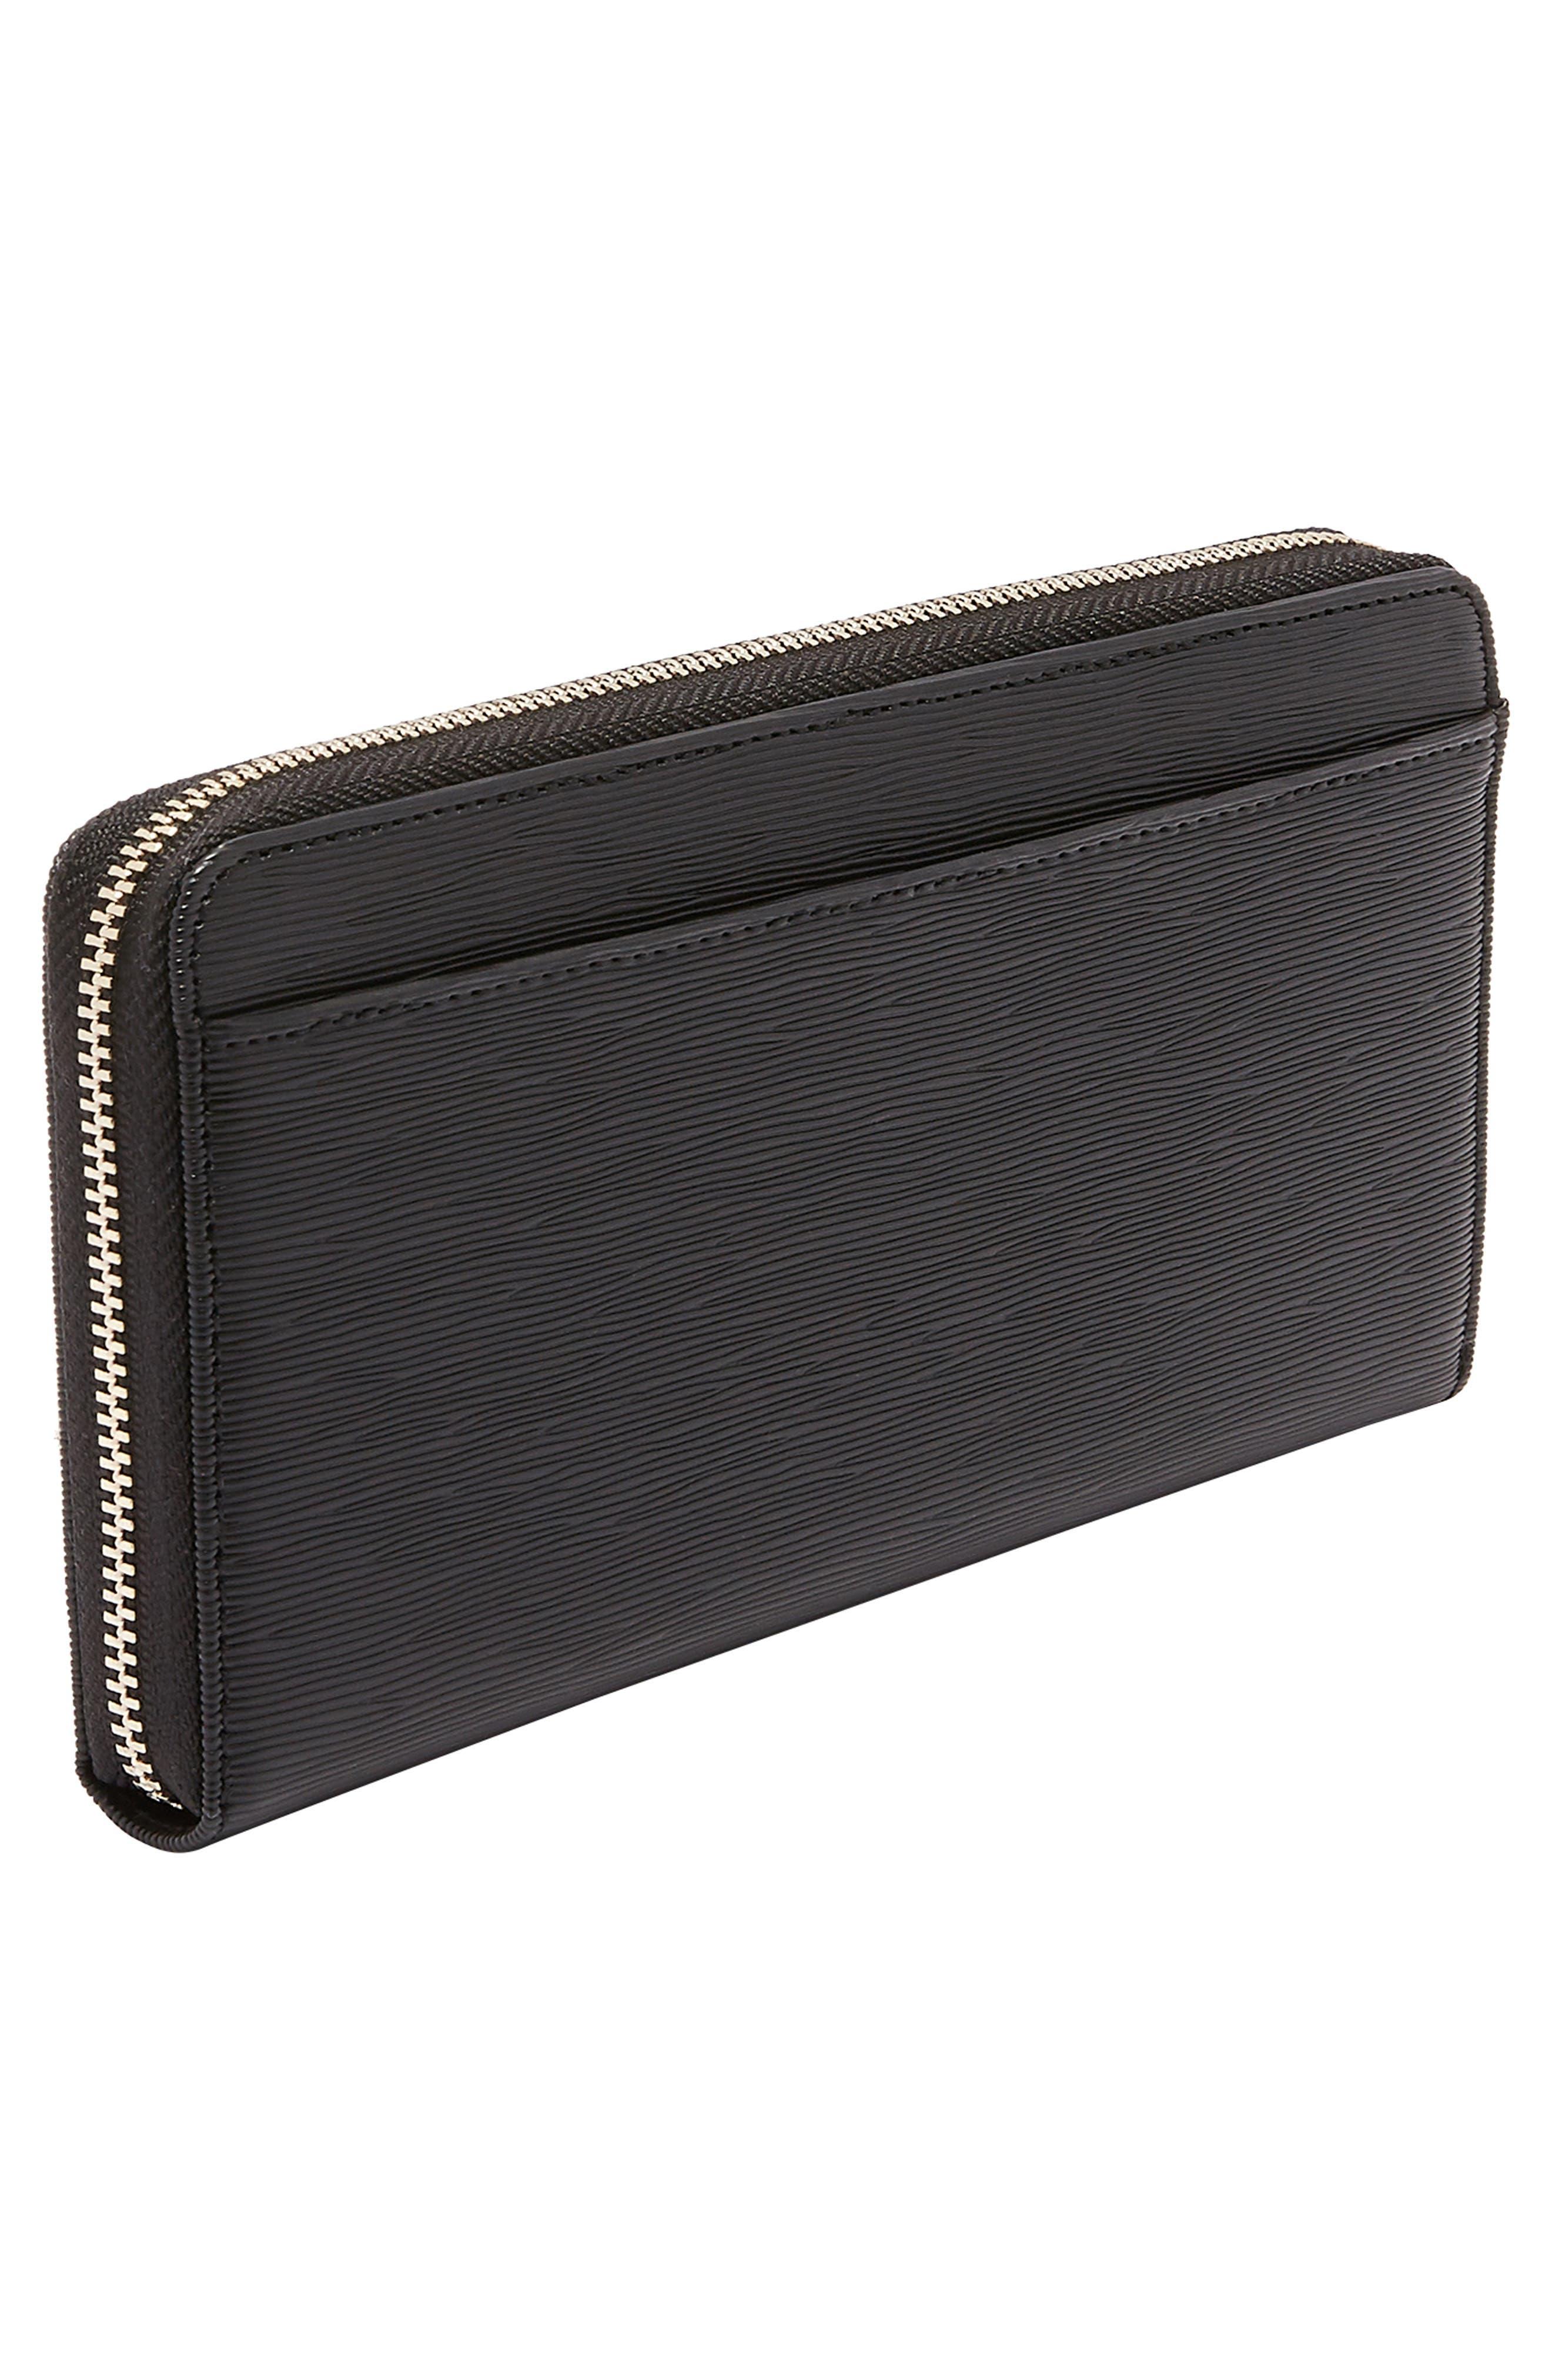 Peony Plissé Leather Matinee Wallet,                             Alternate thumbnail 5, color,                             001